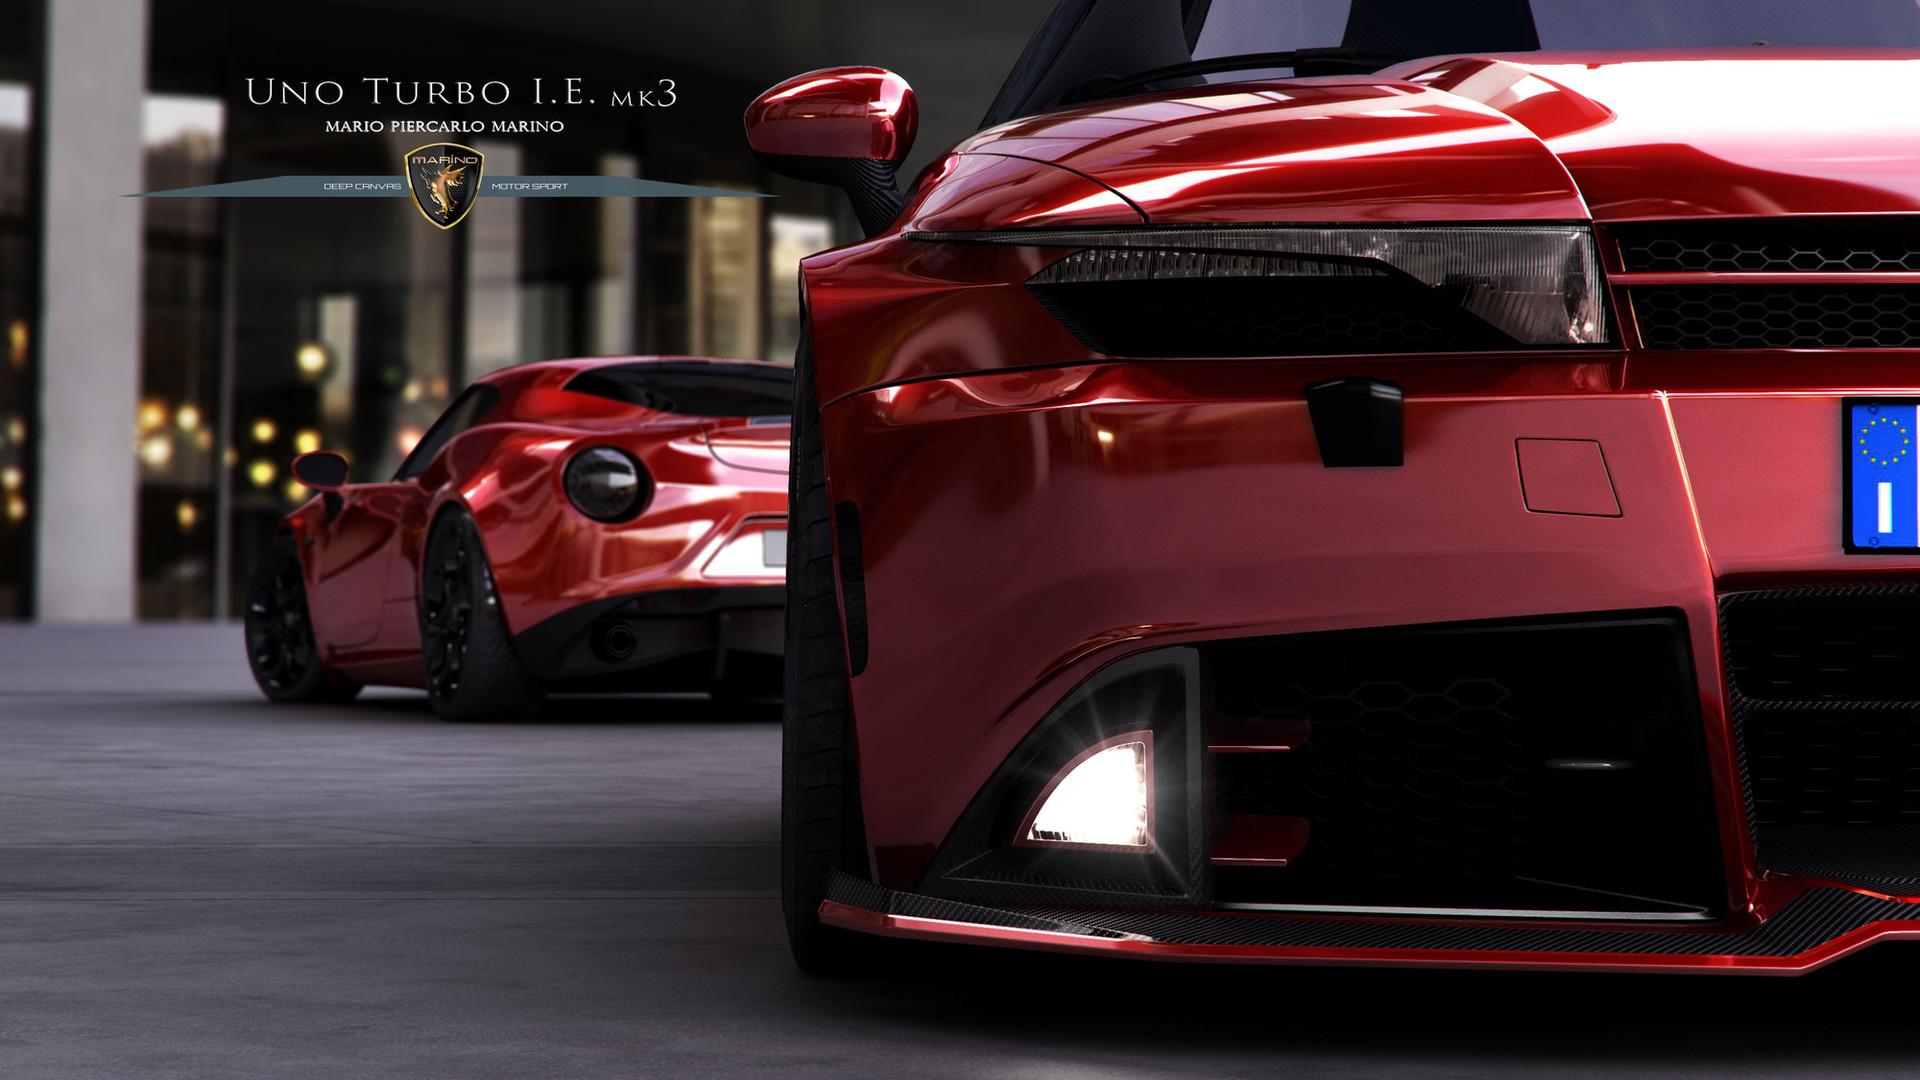 Uno Turbo mk 3 Marino Mario Piercarlo